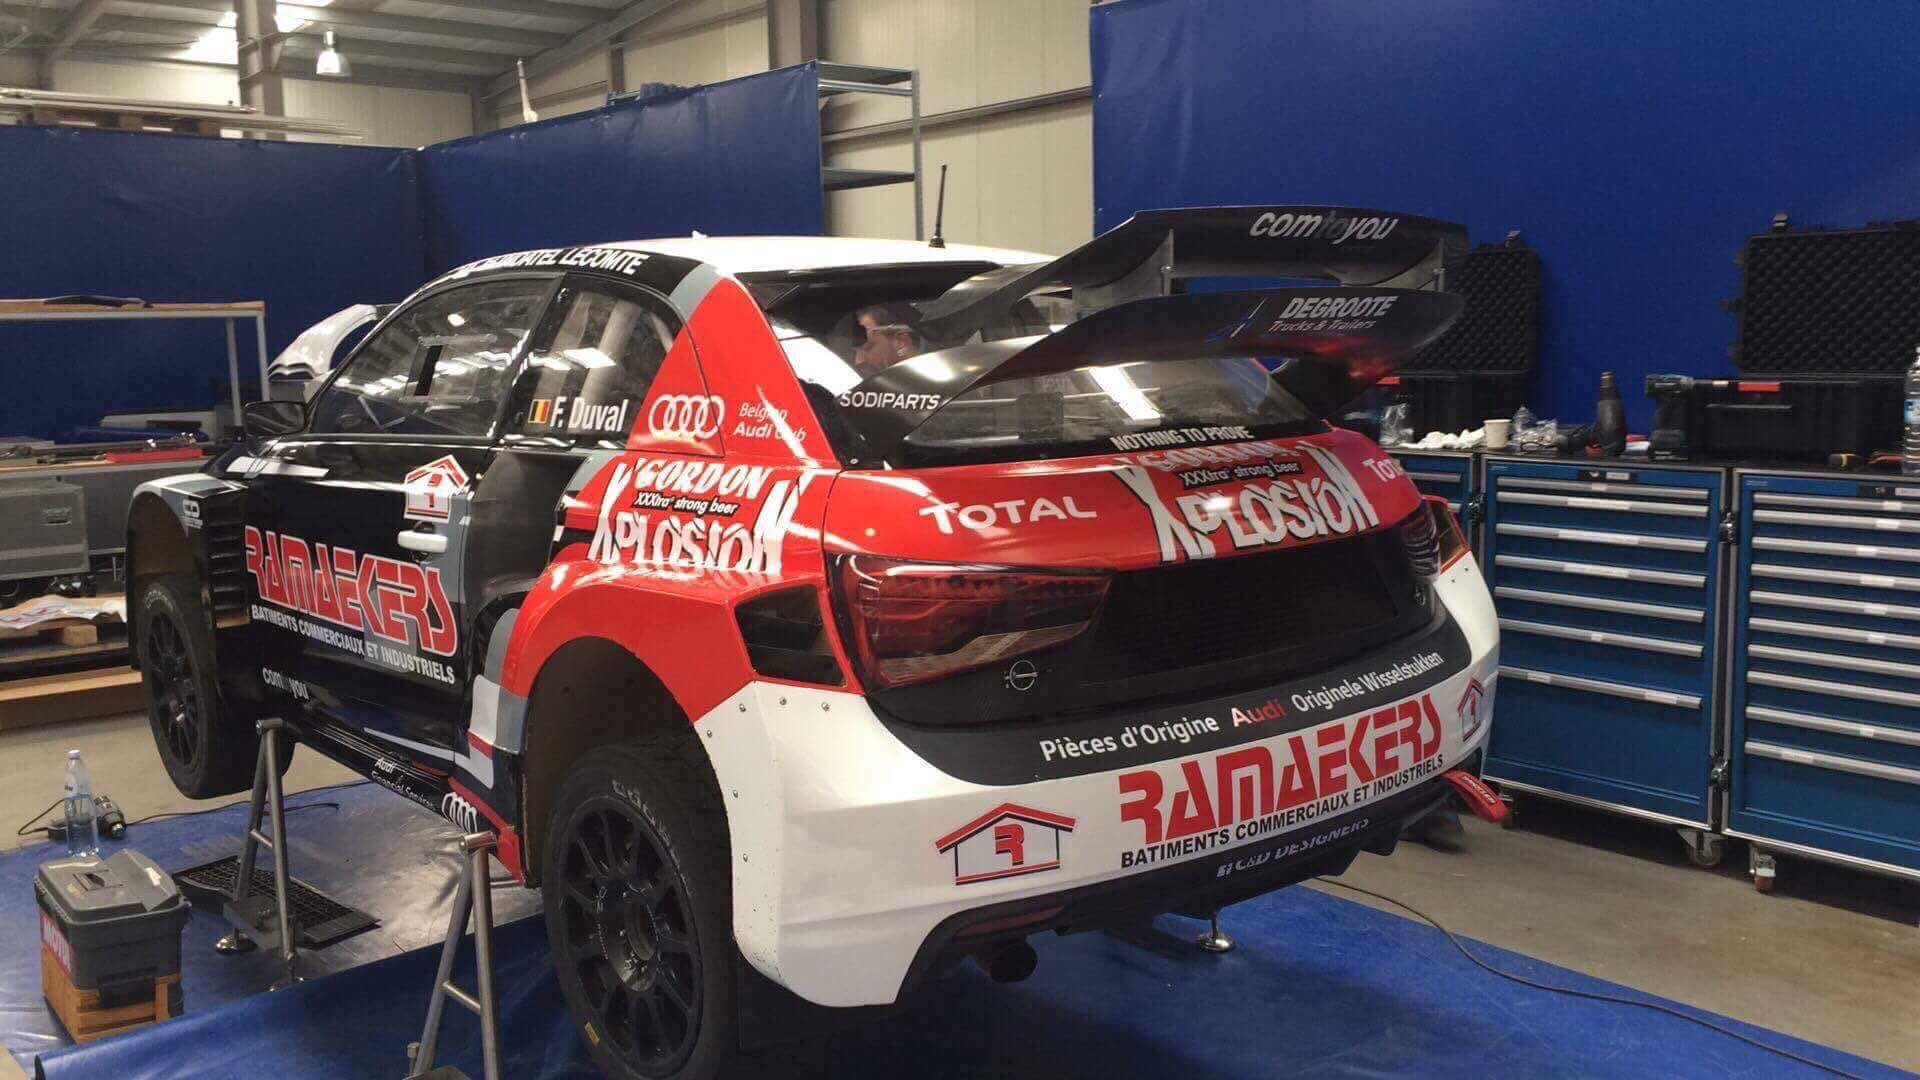 Mundial de Rallycross: Temporada 2018 - Página 9 DcwoMafW4AAsb0n